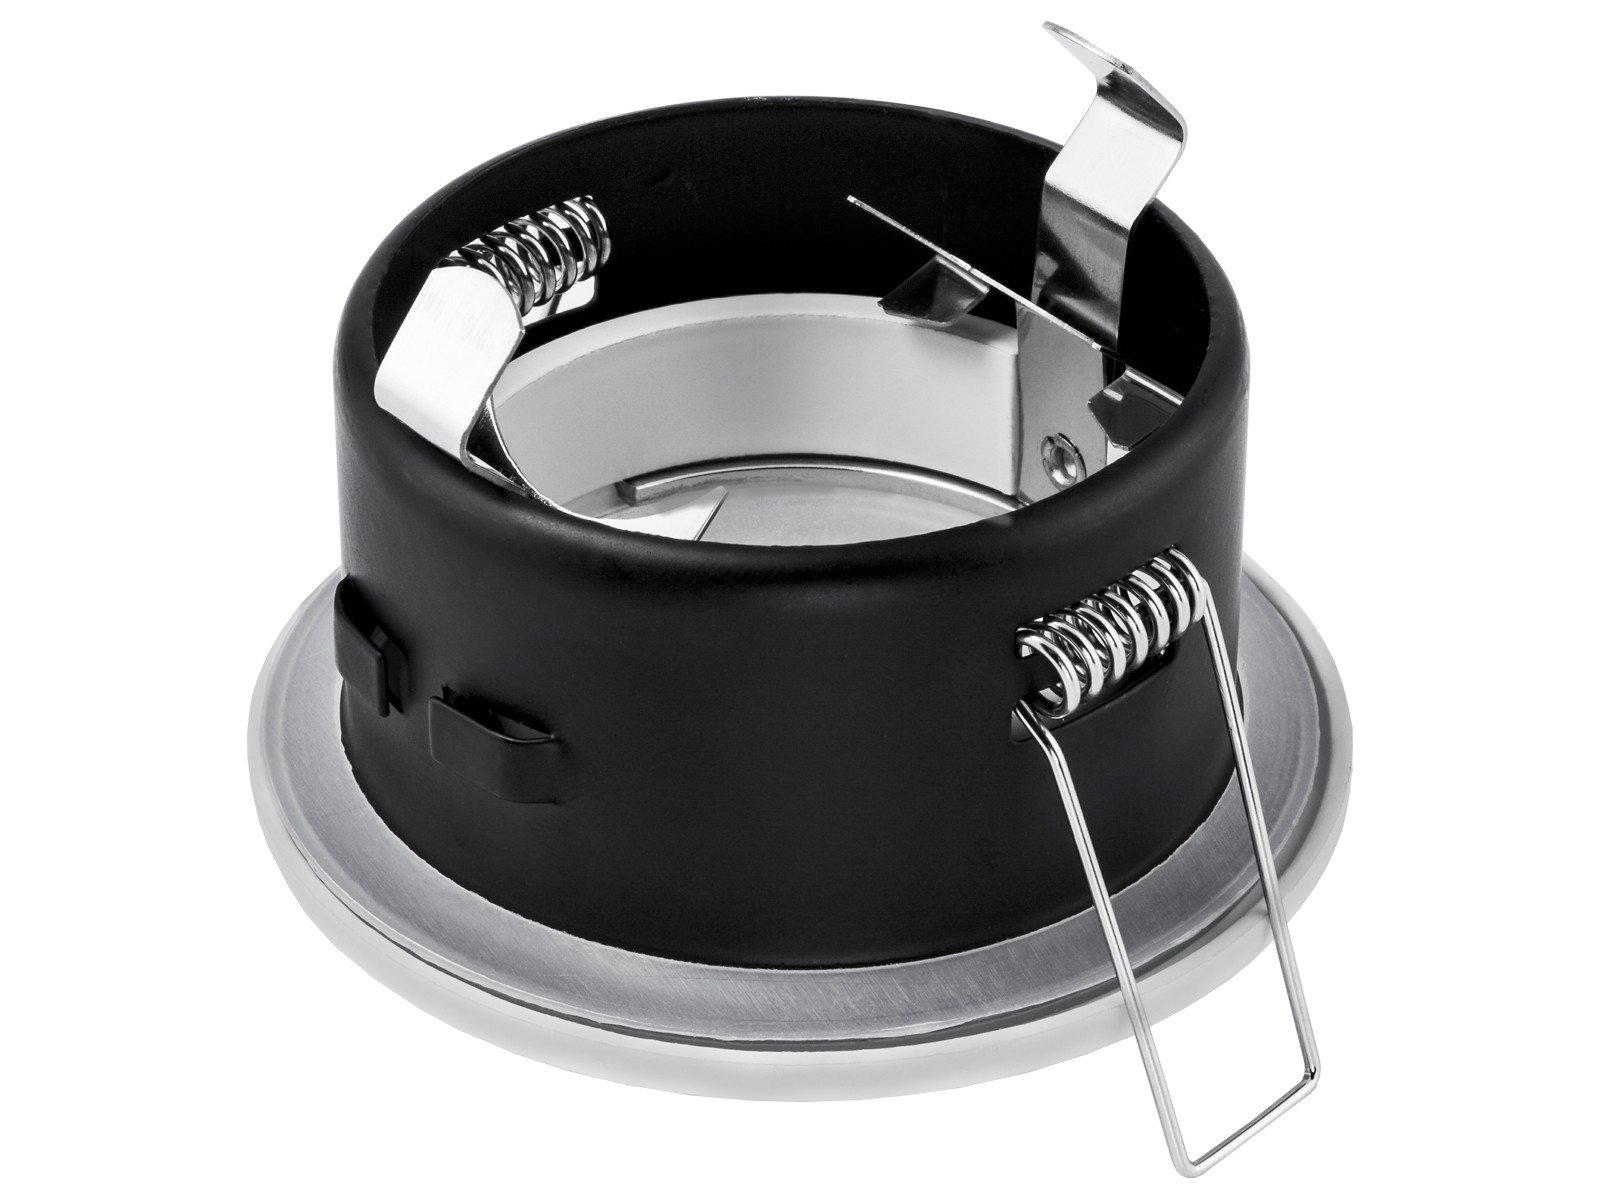 led einbaustrahler ip65 neutralwei gu10 3w 230v edelstahl optik rund starr. Black Bedroom Furniture Sets. Home Design Ideas